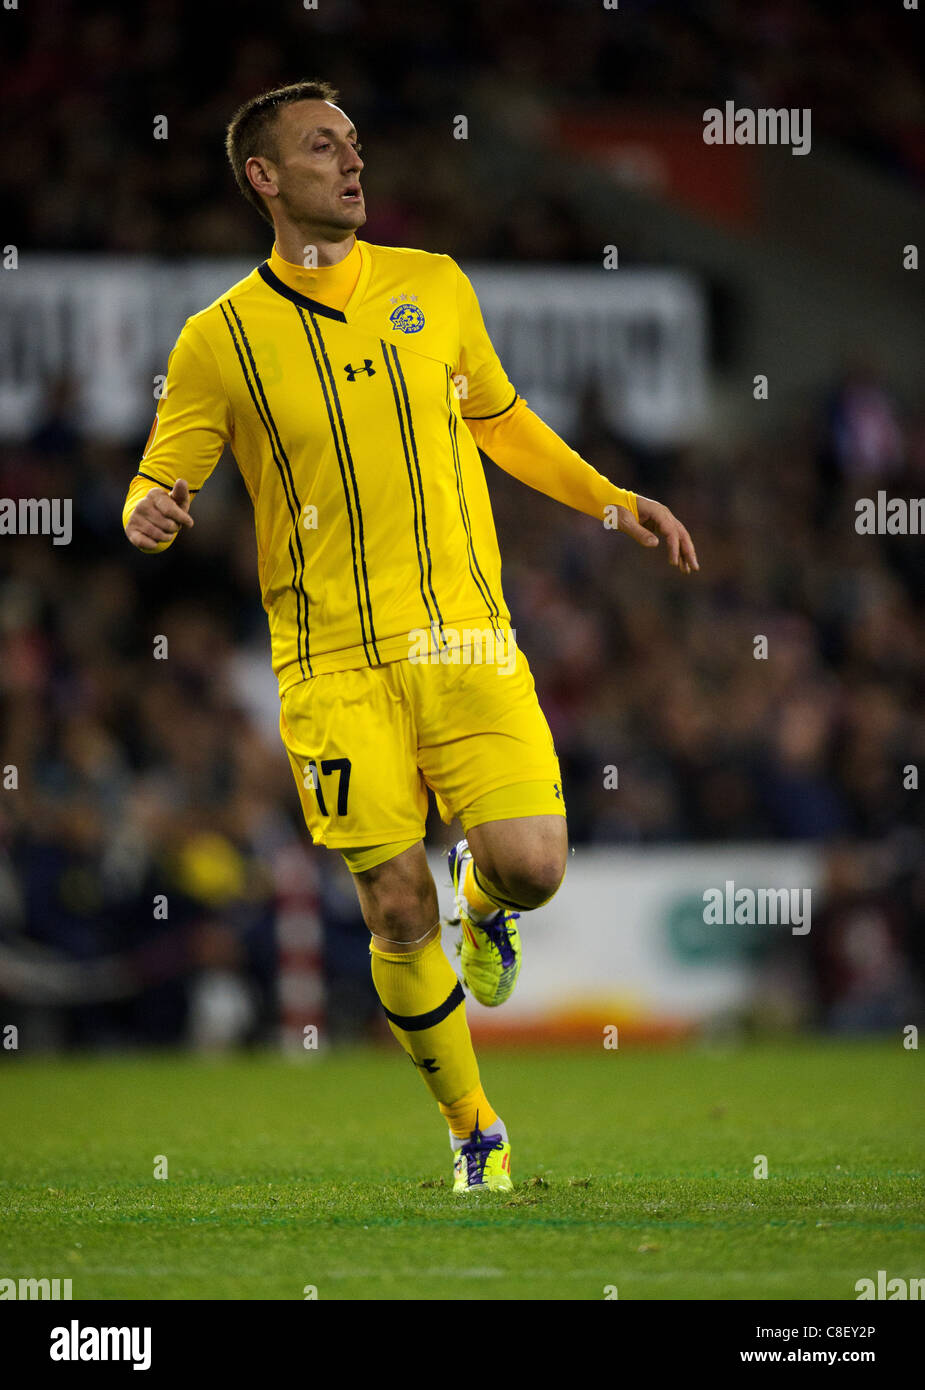 Savo Pavicevic of Maccabi Tel Aviv - Stock Image